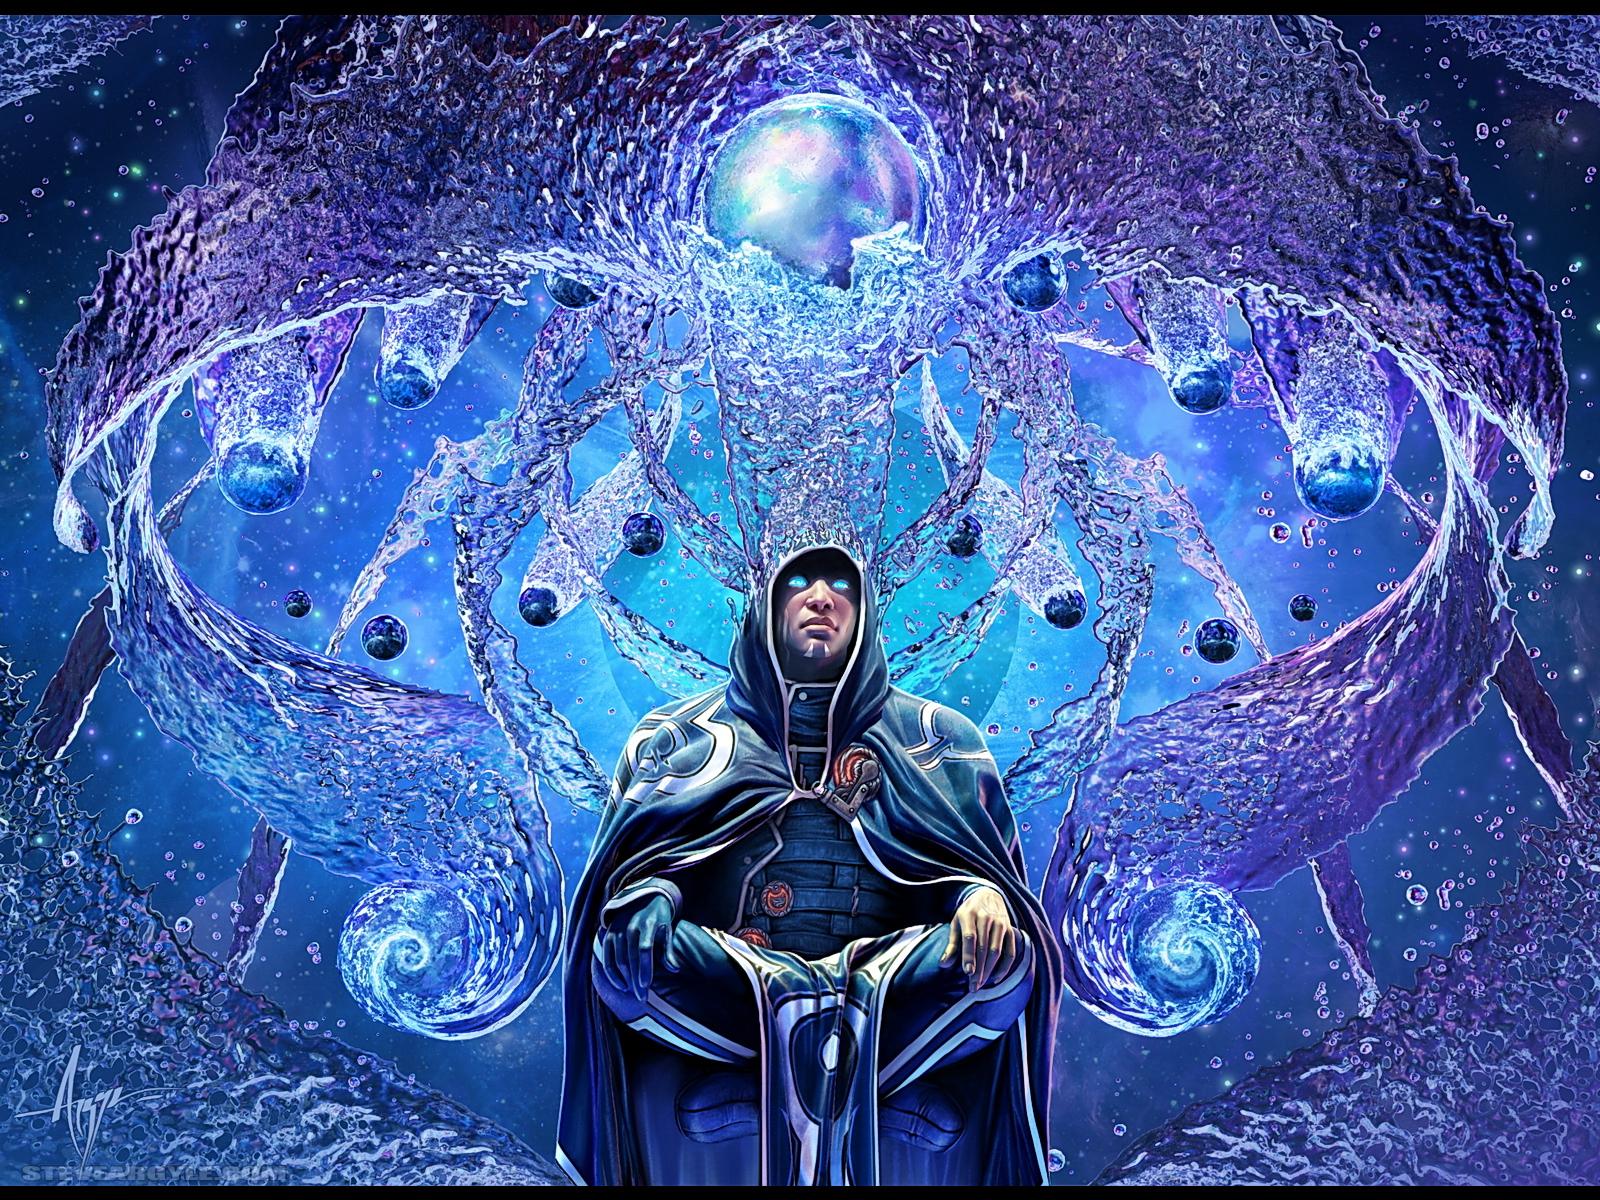 [48+] Magic The Gathering Jace Wallpaper on WallpaperSafari  Jace The Mind Sculptor Wallpaper